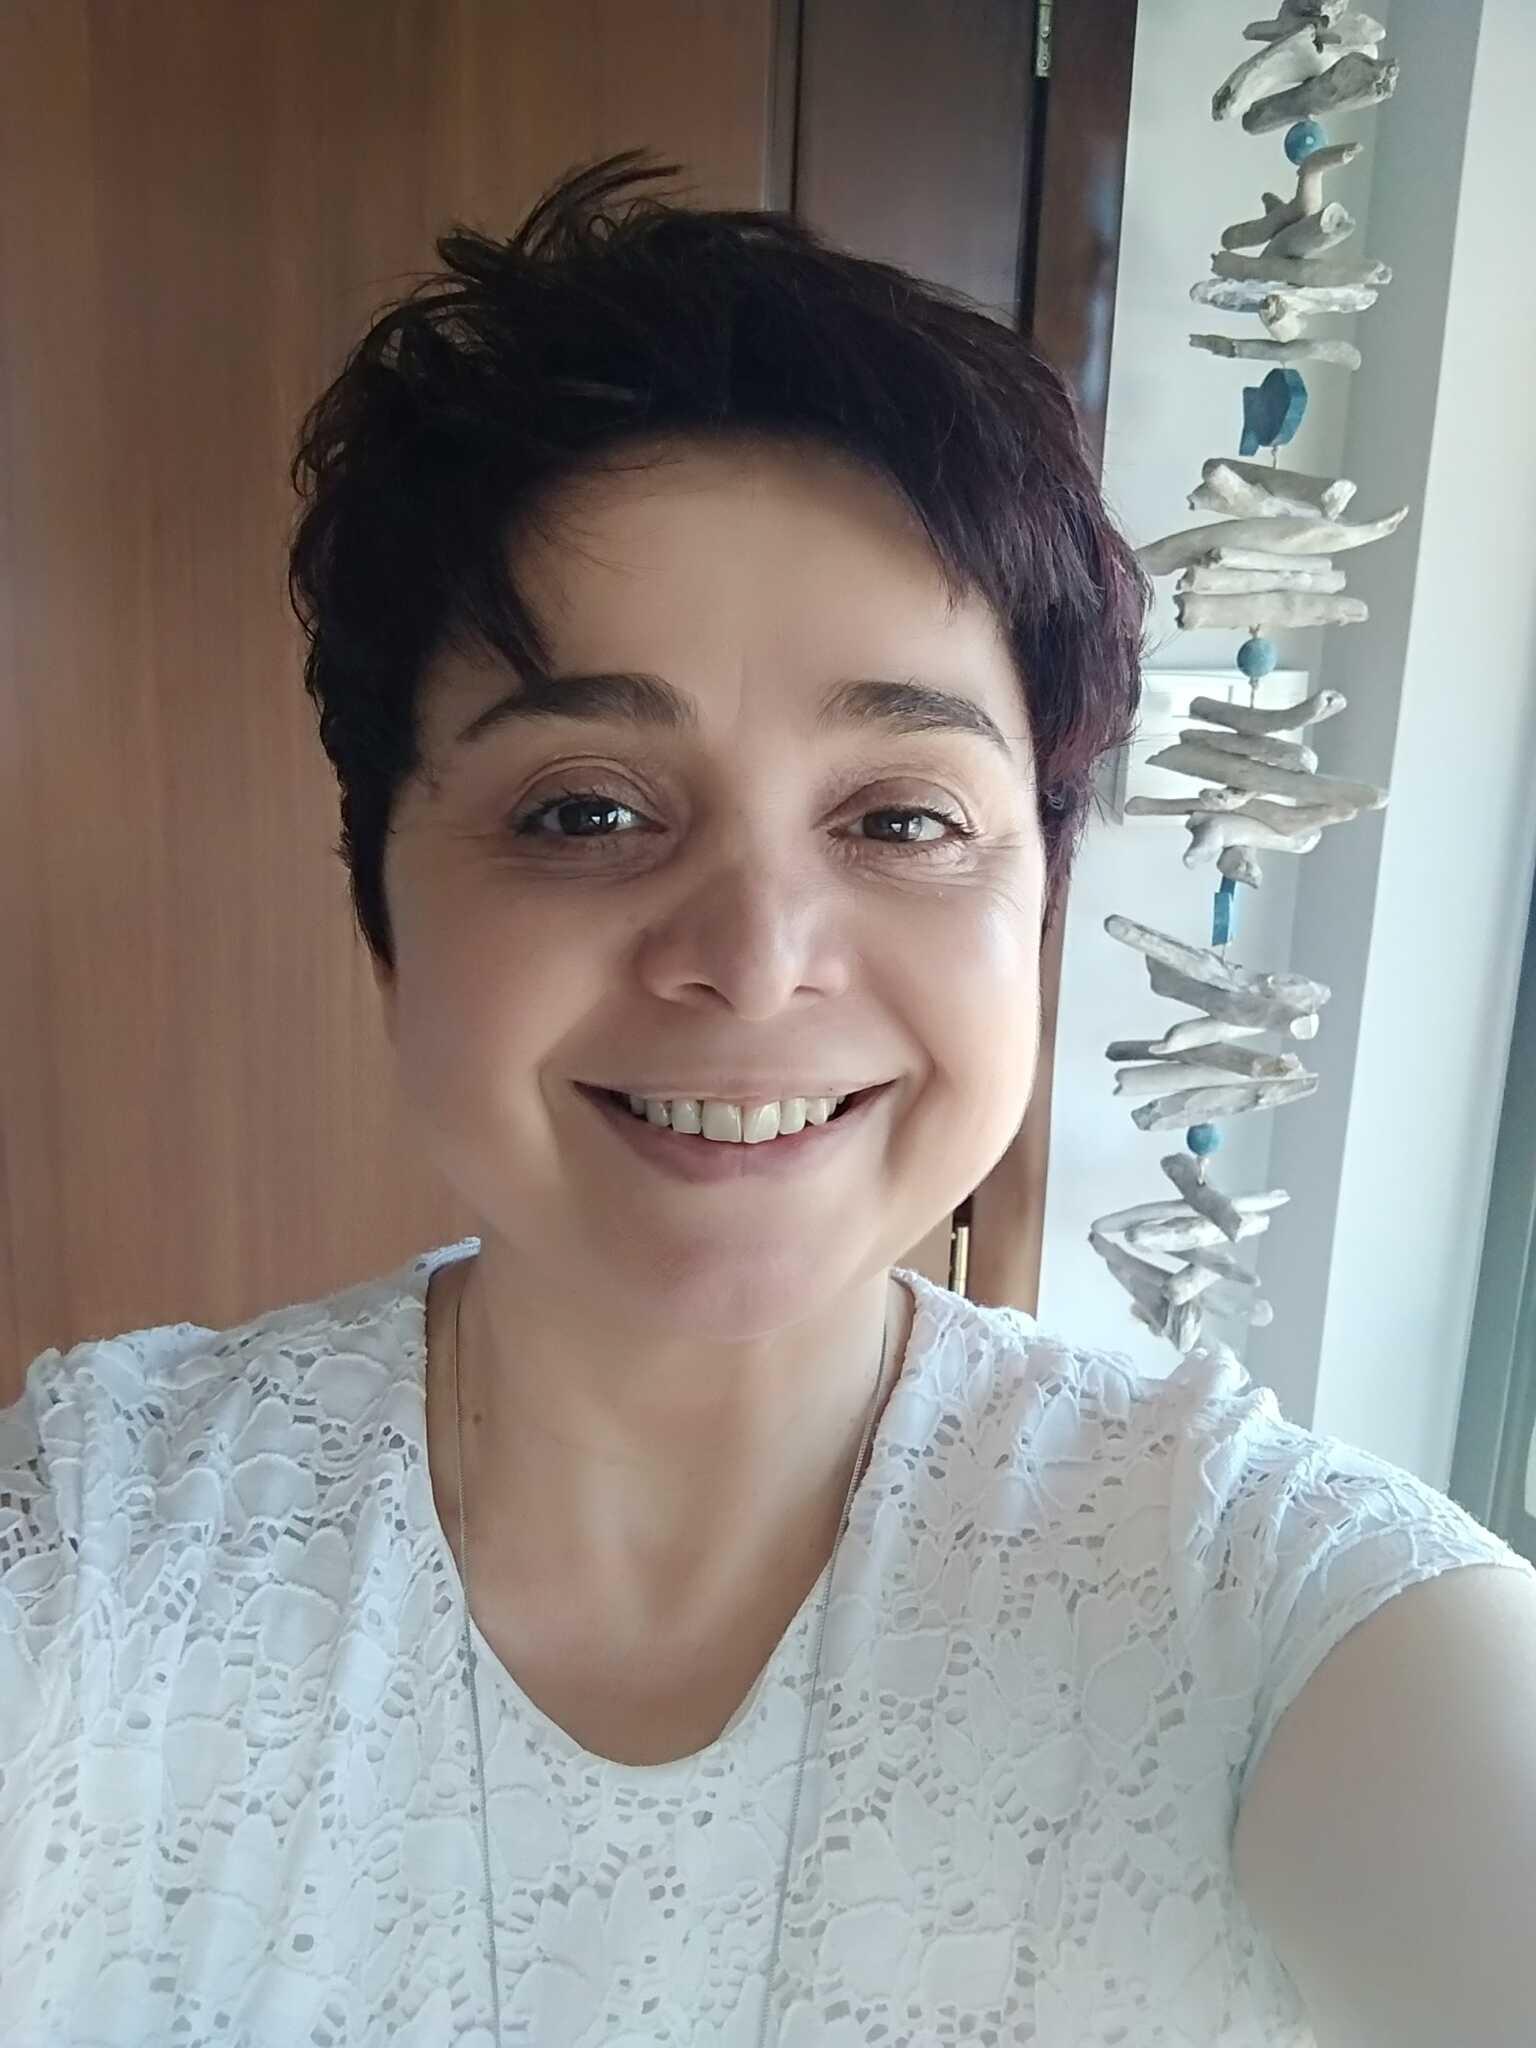 Raluca-Mihaela Lupu